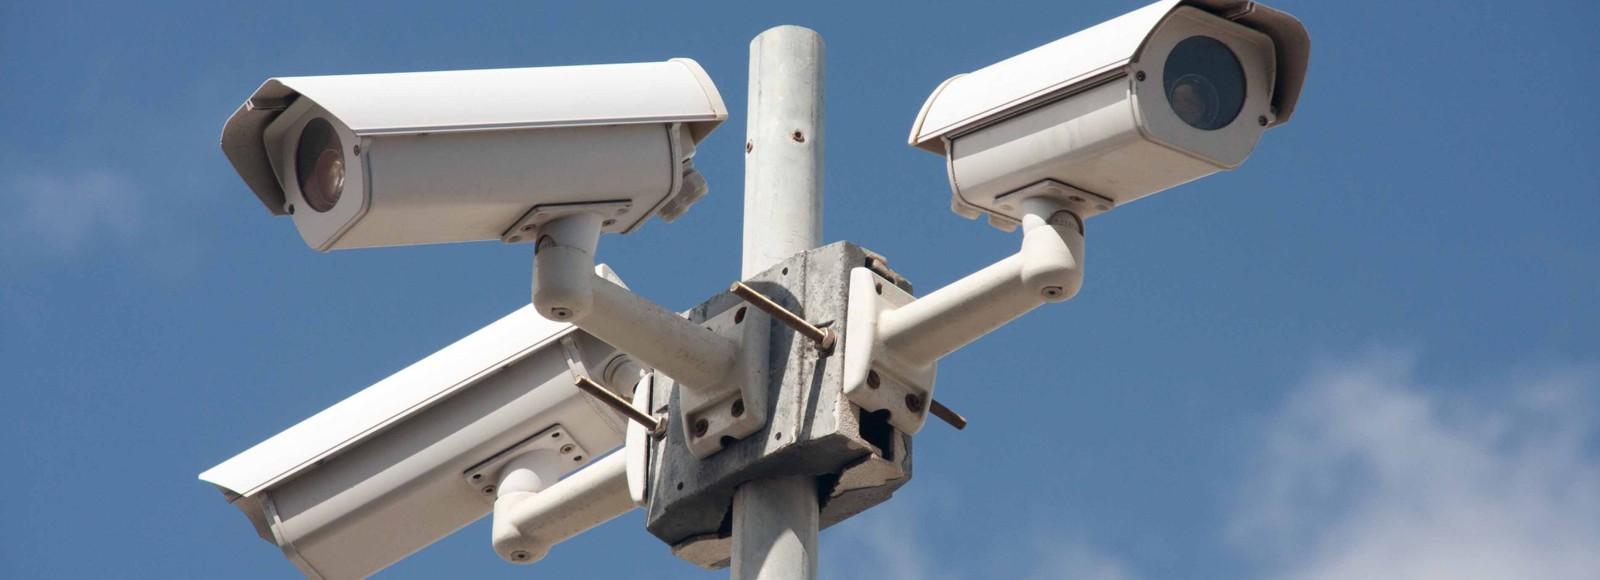 CCTV Video Surveillance Chennai India.